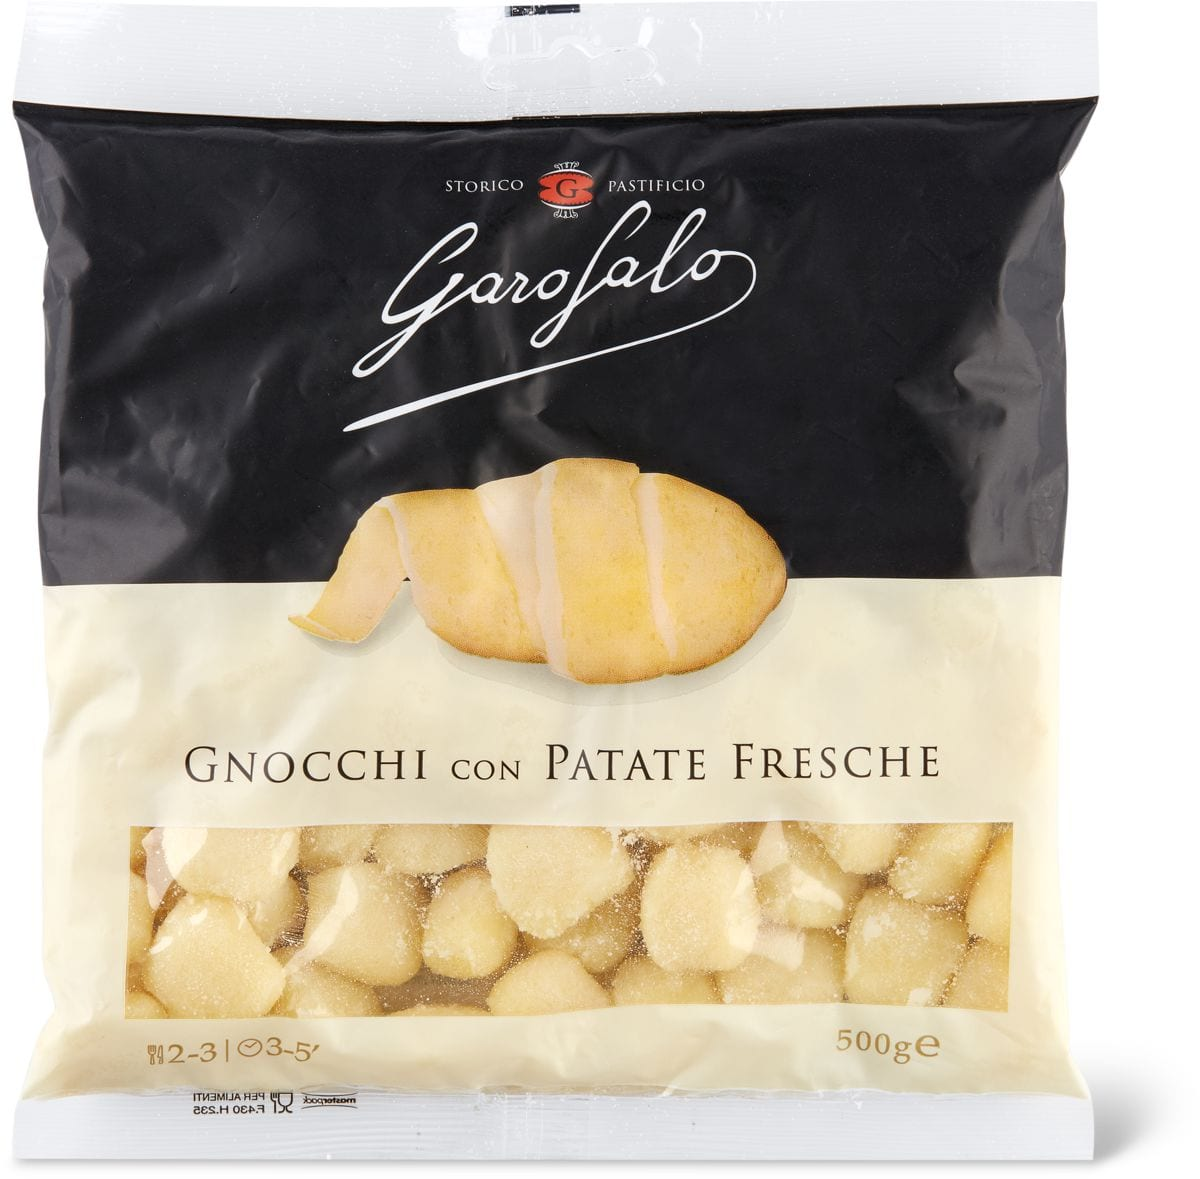 Garofalo Gnocchi